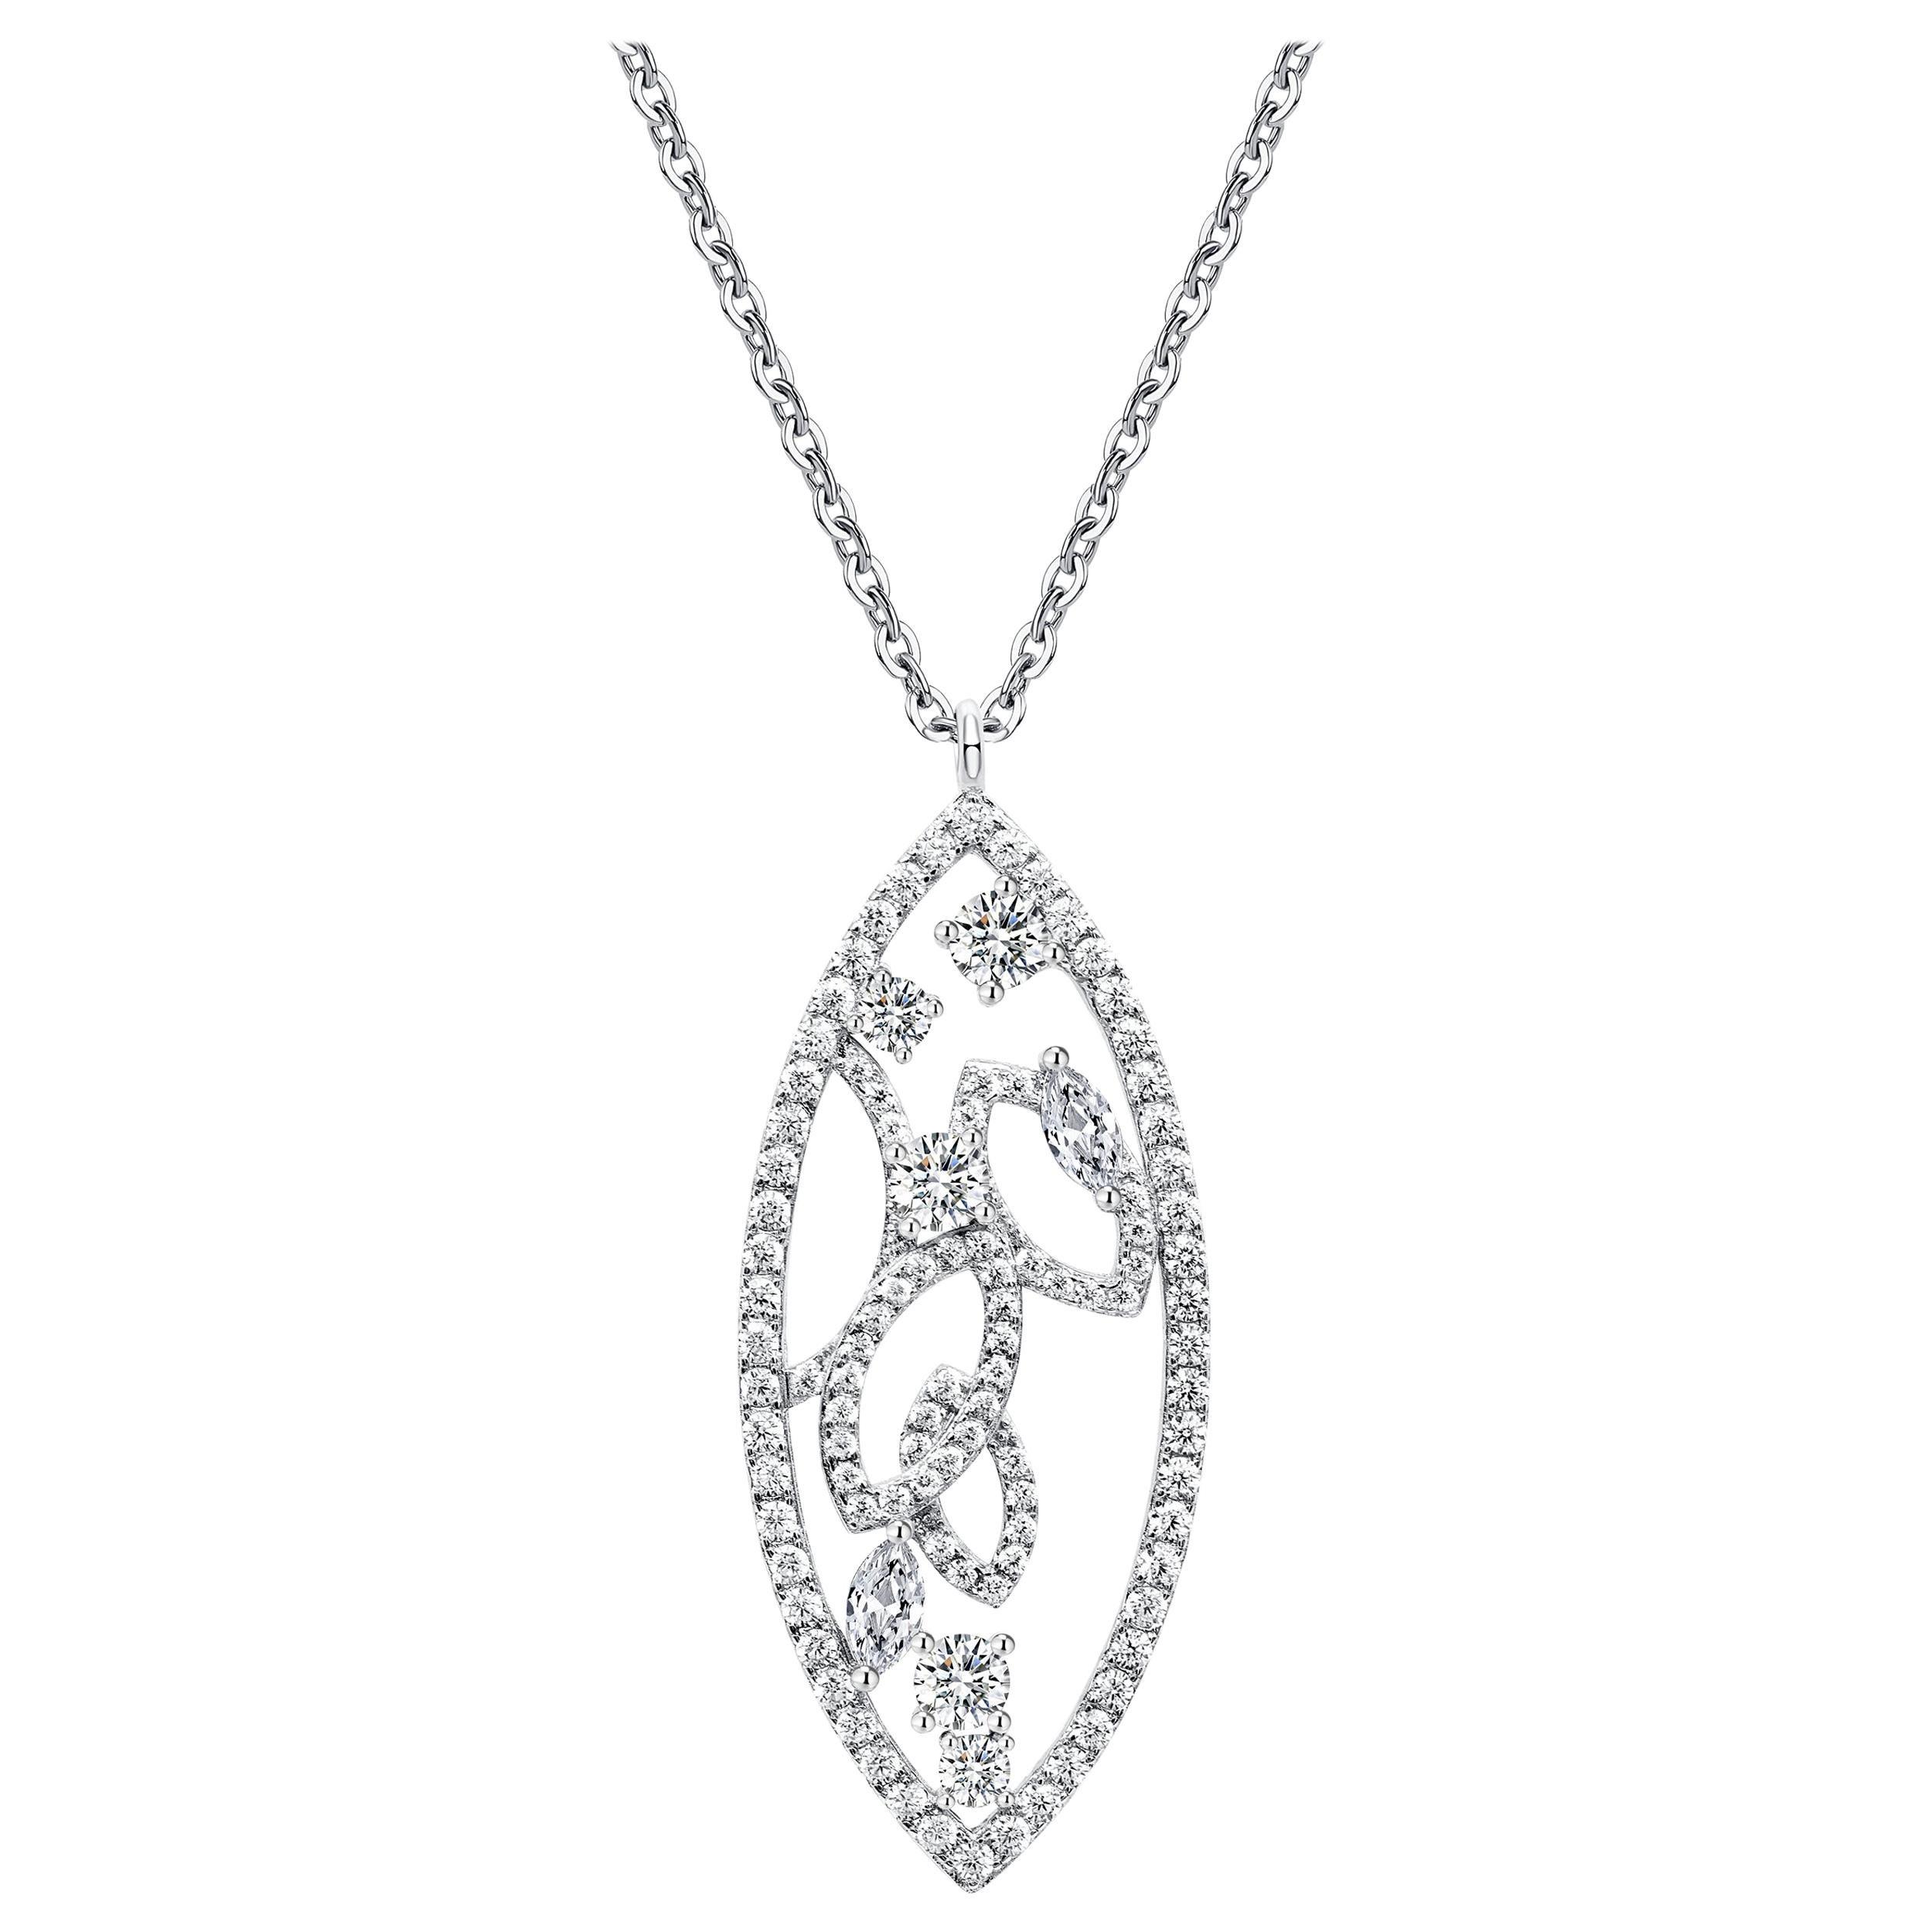 18 Karat White Gold Diamond Lattice Pendant Necklace